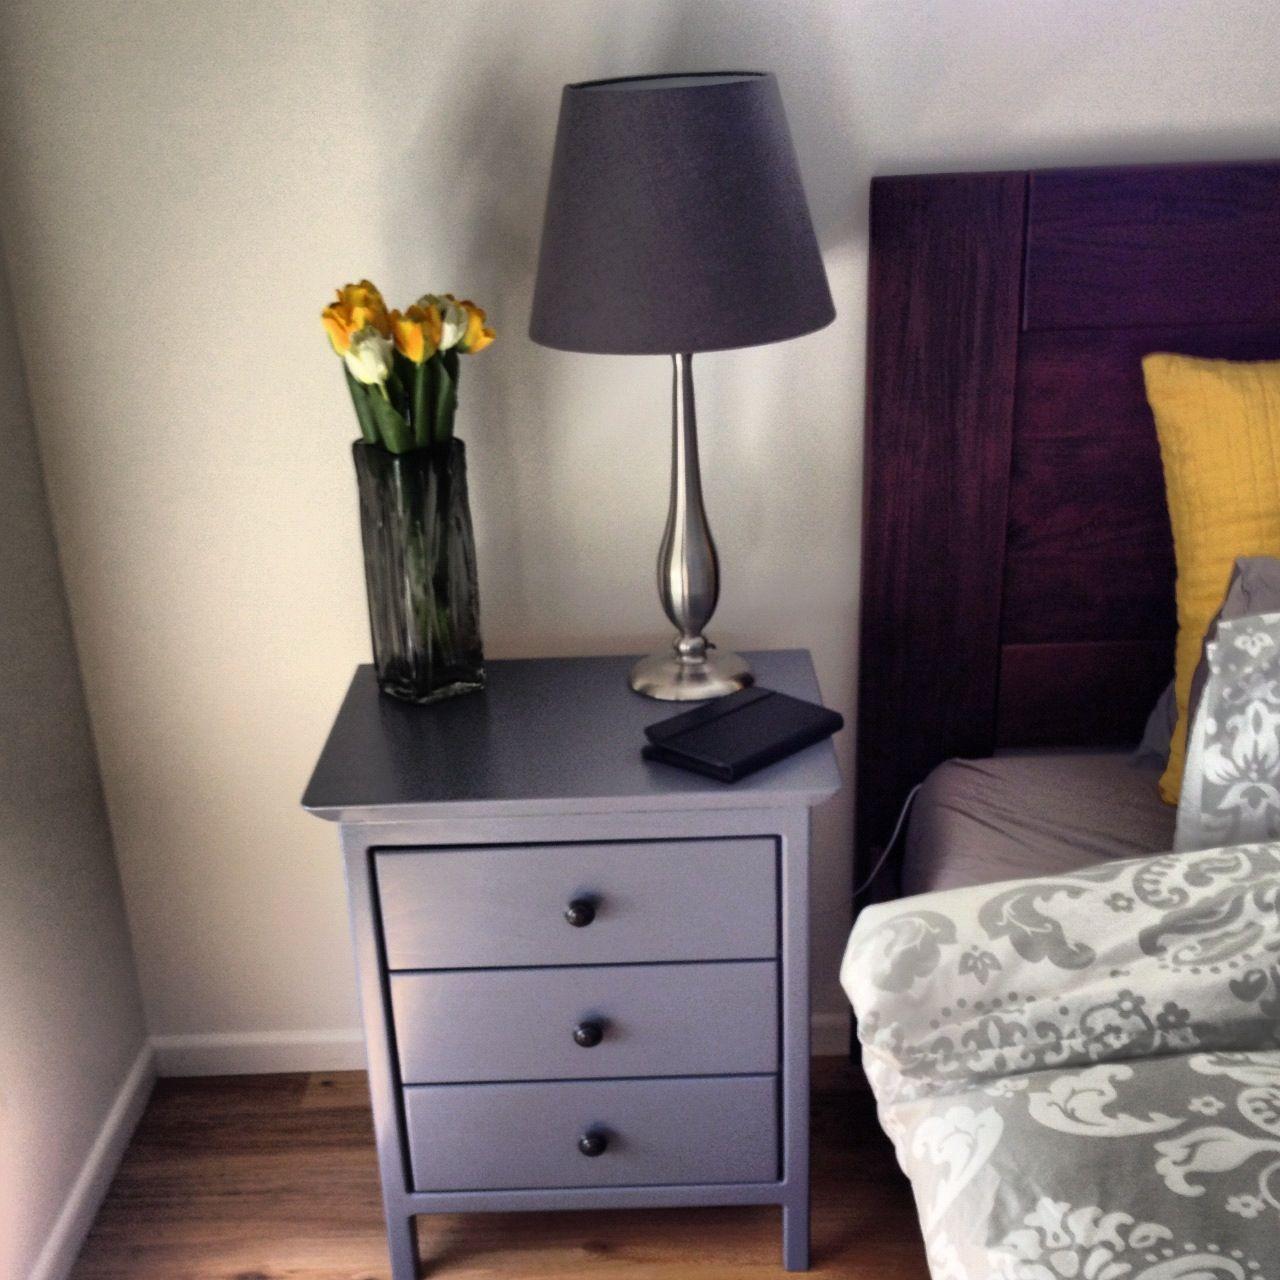 Refinished nightstand diy pinterest refinished nightstand